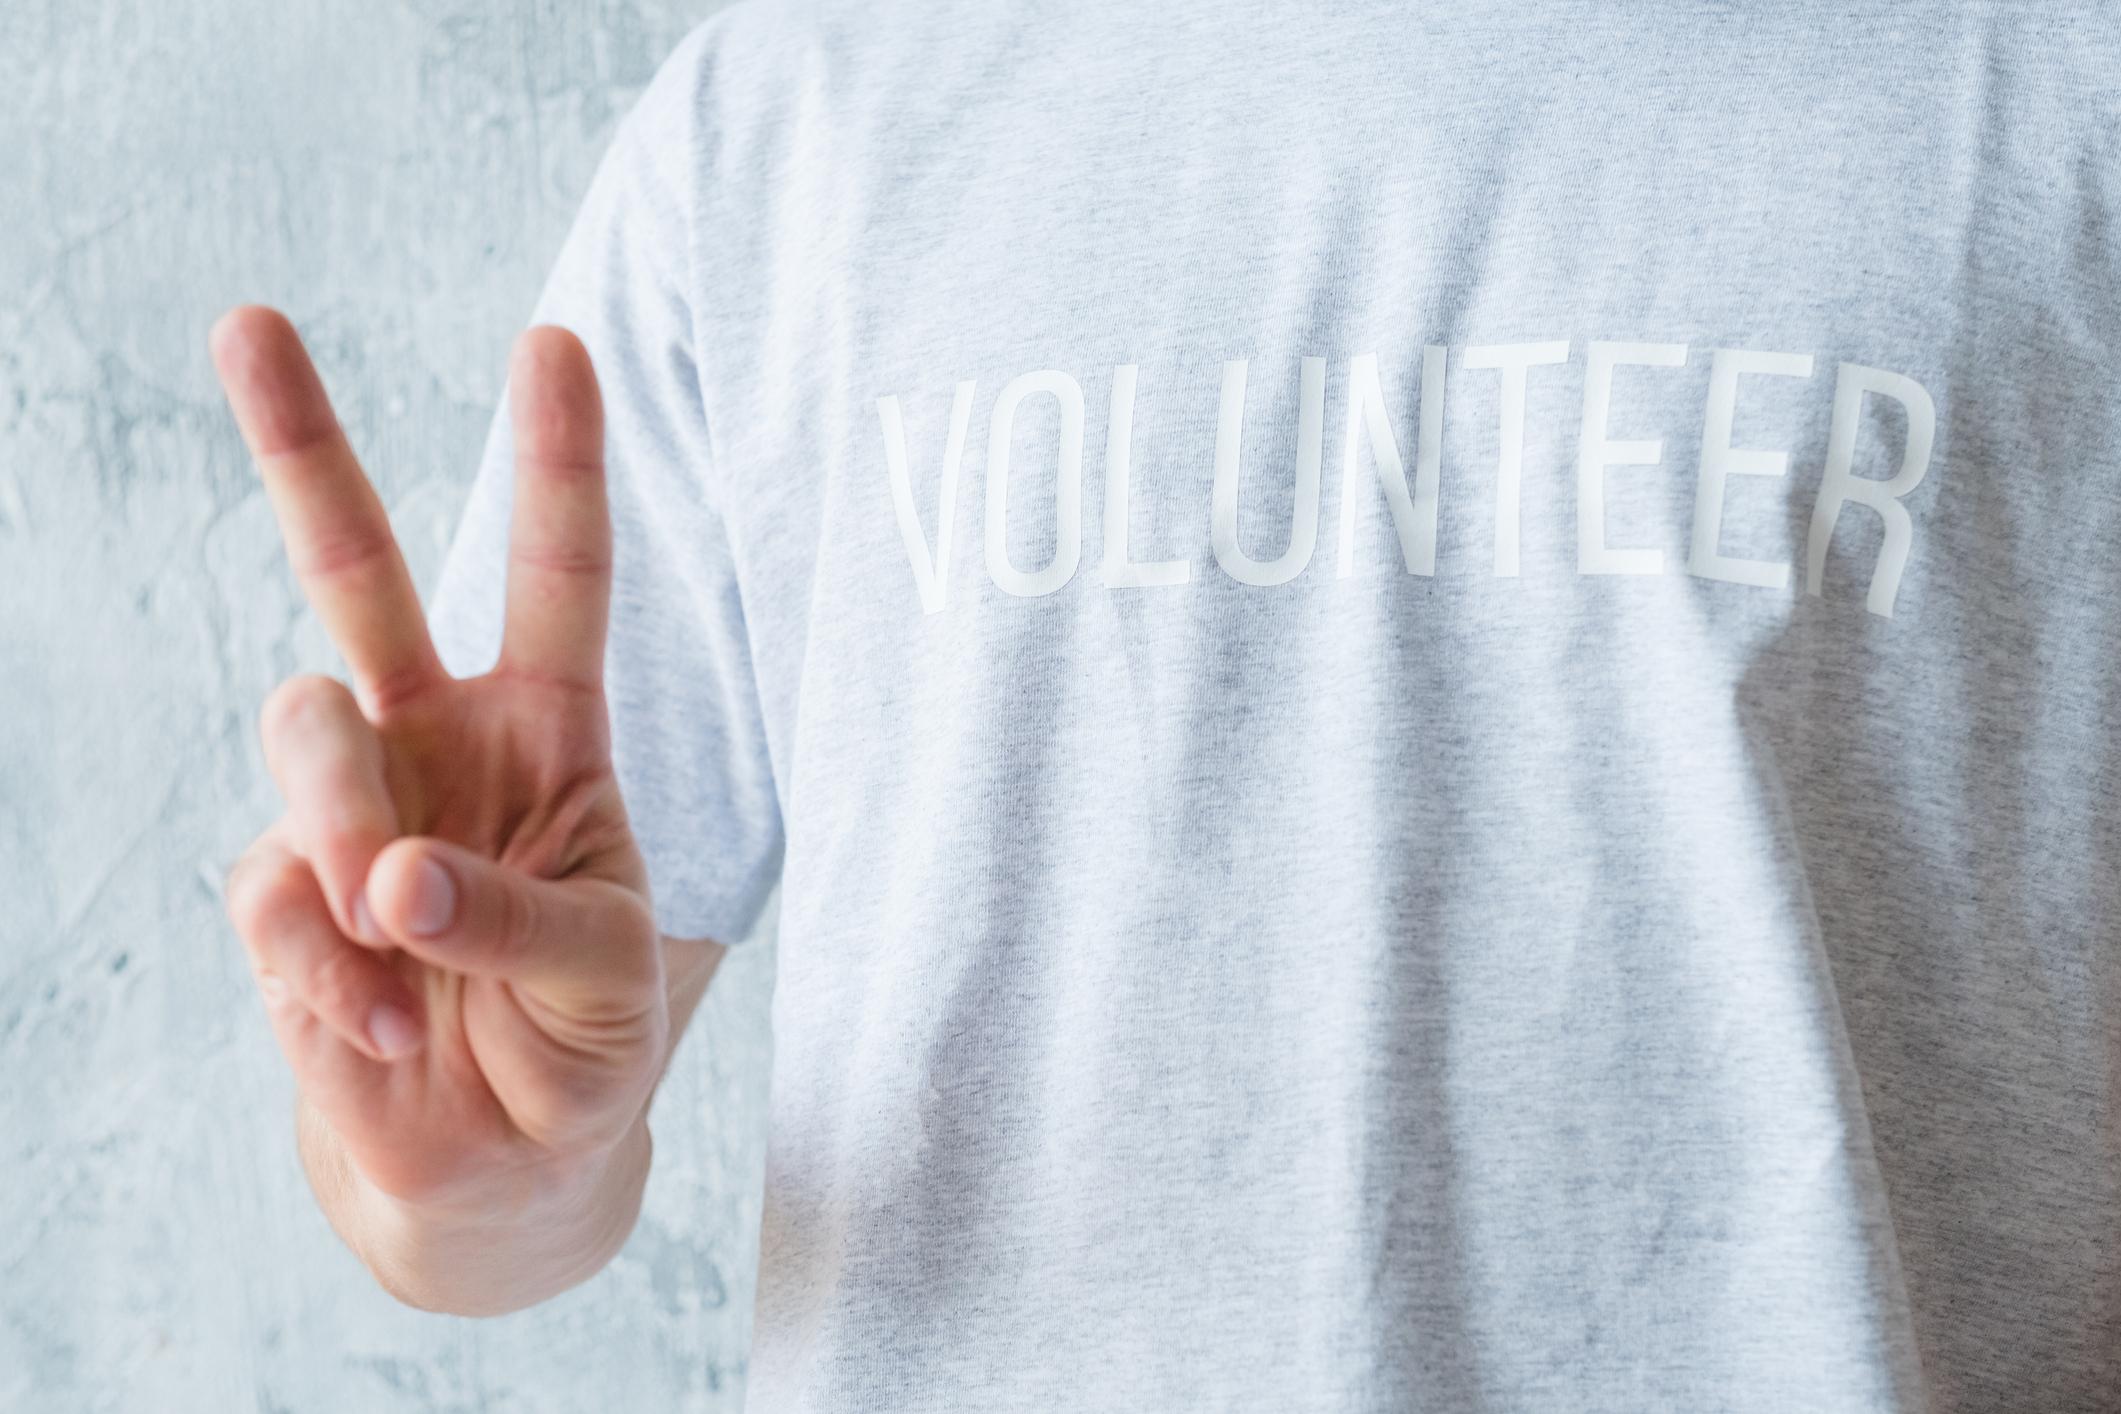 volunteering-modern-lifestyle-man-show-v-sign-1129785844_2125x1416.jpeg